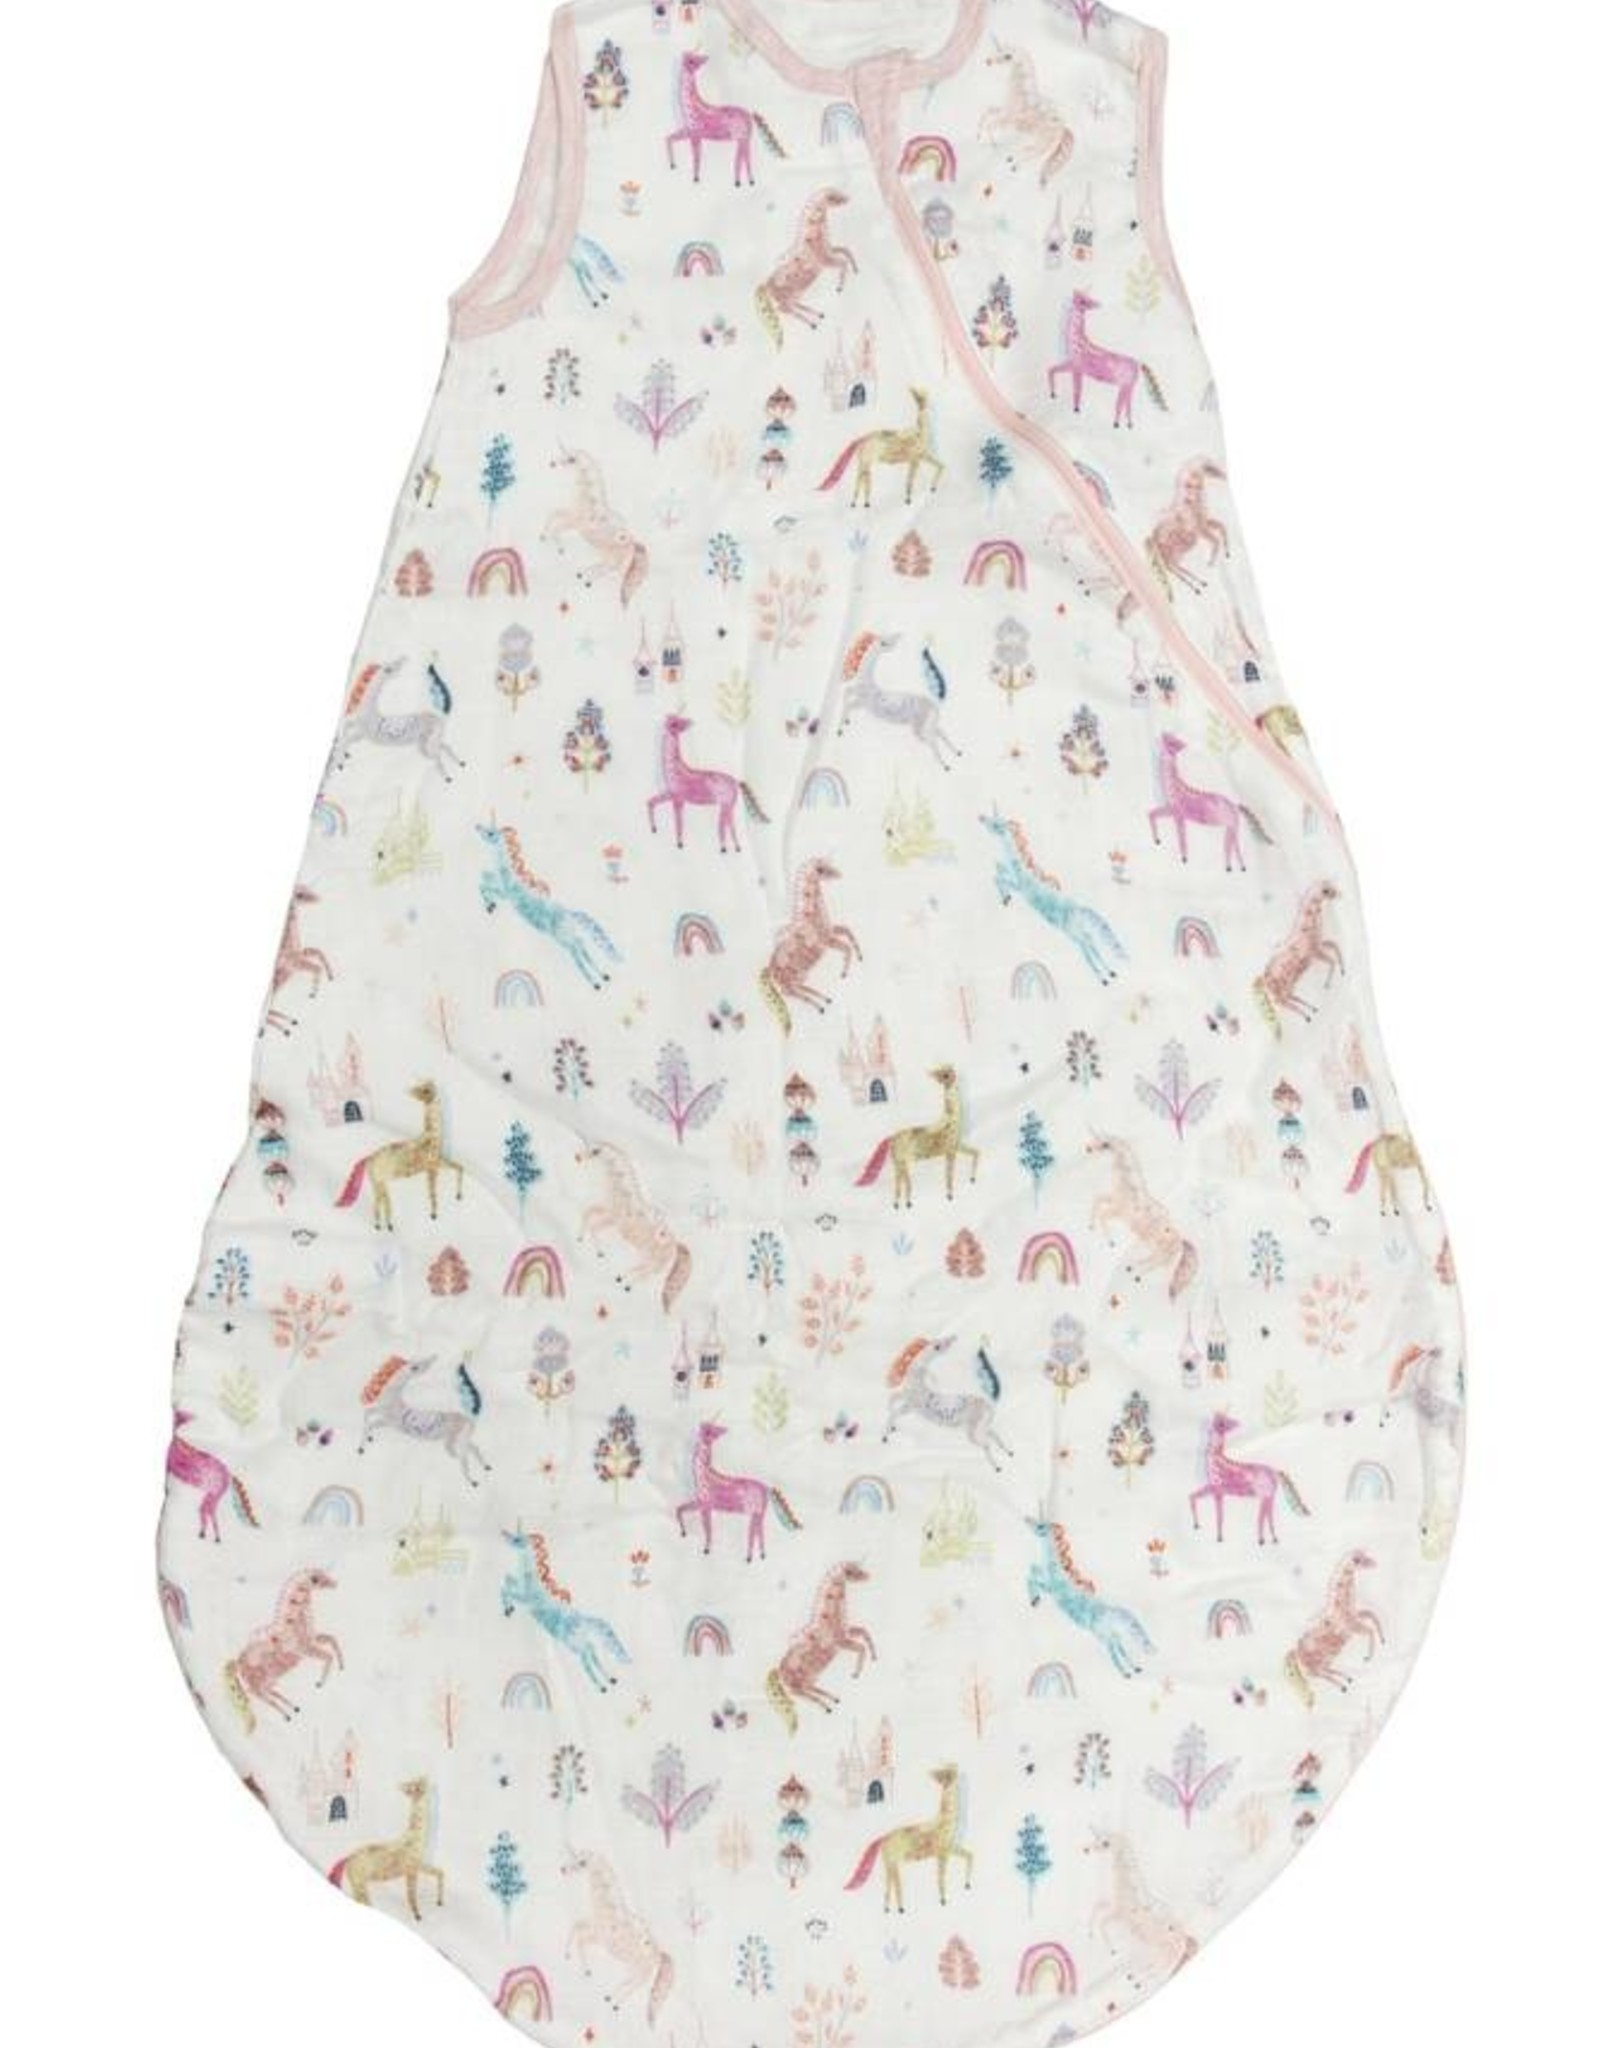 LouLou Lollipop Sleeping Bag - Unicorn Dream